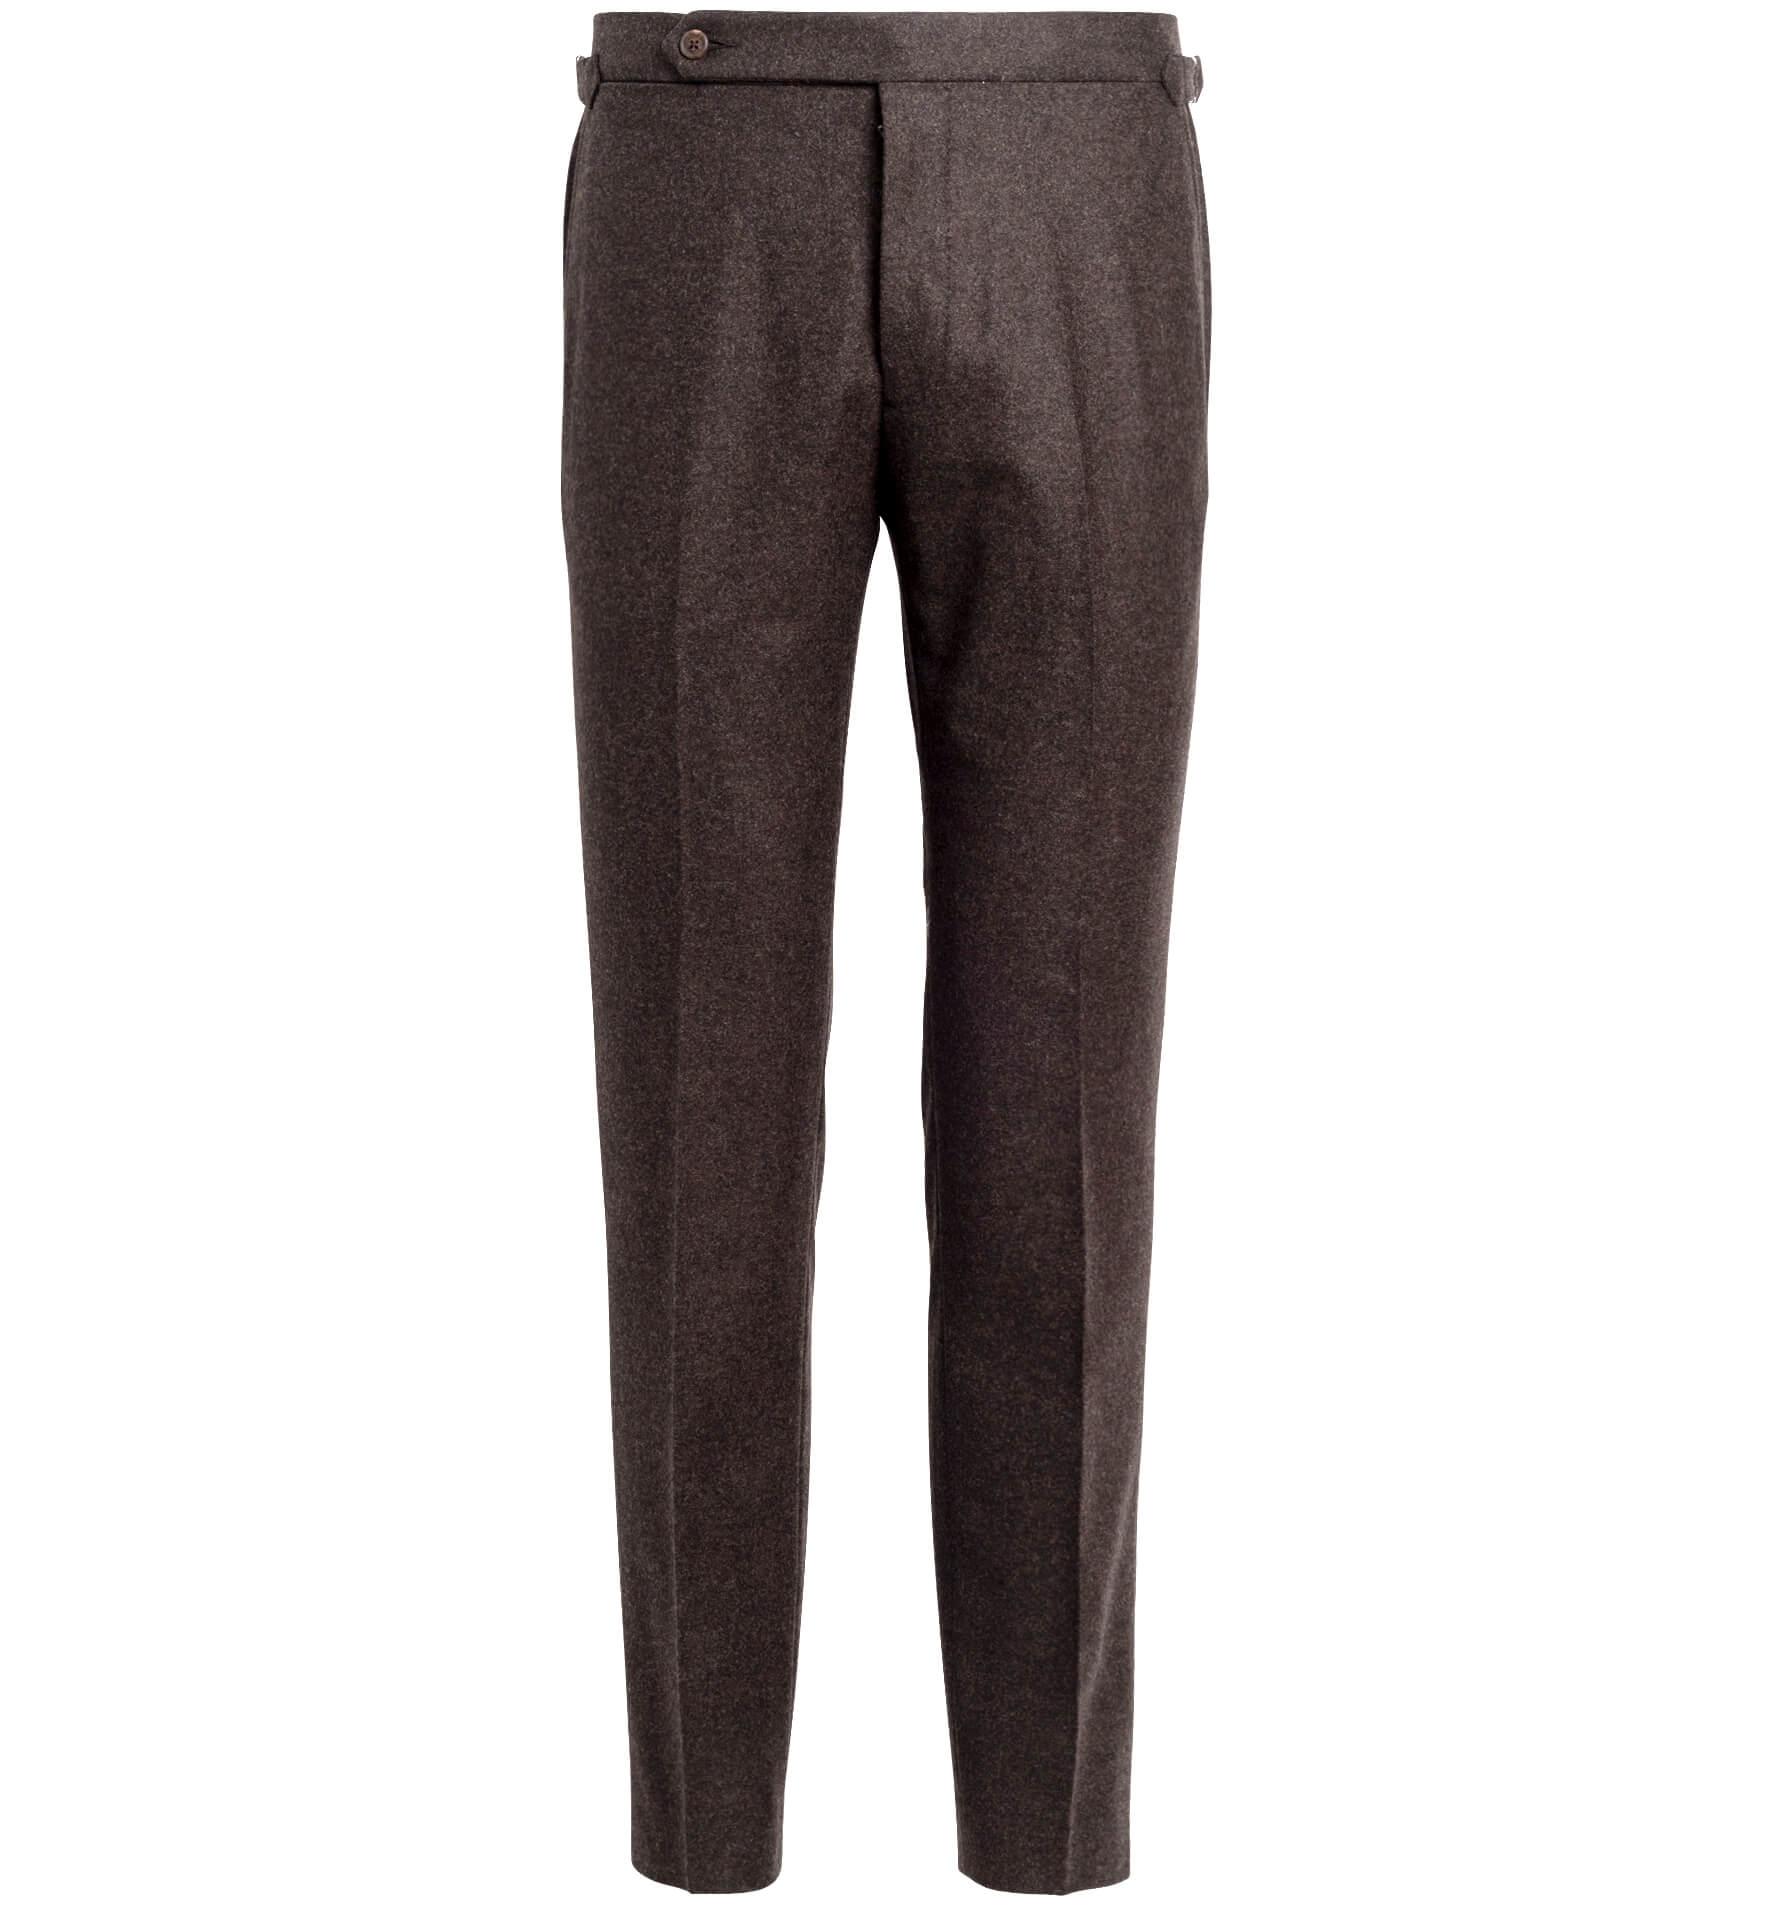 Zoom Image of Allen Brown Wool Flannel Trouser